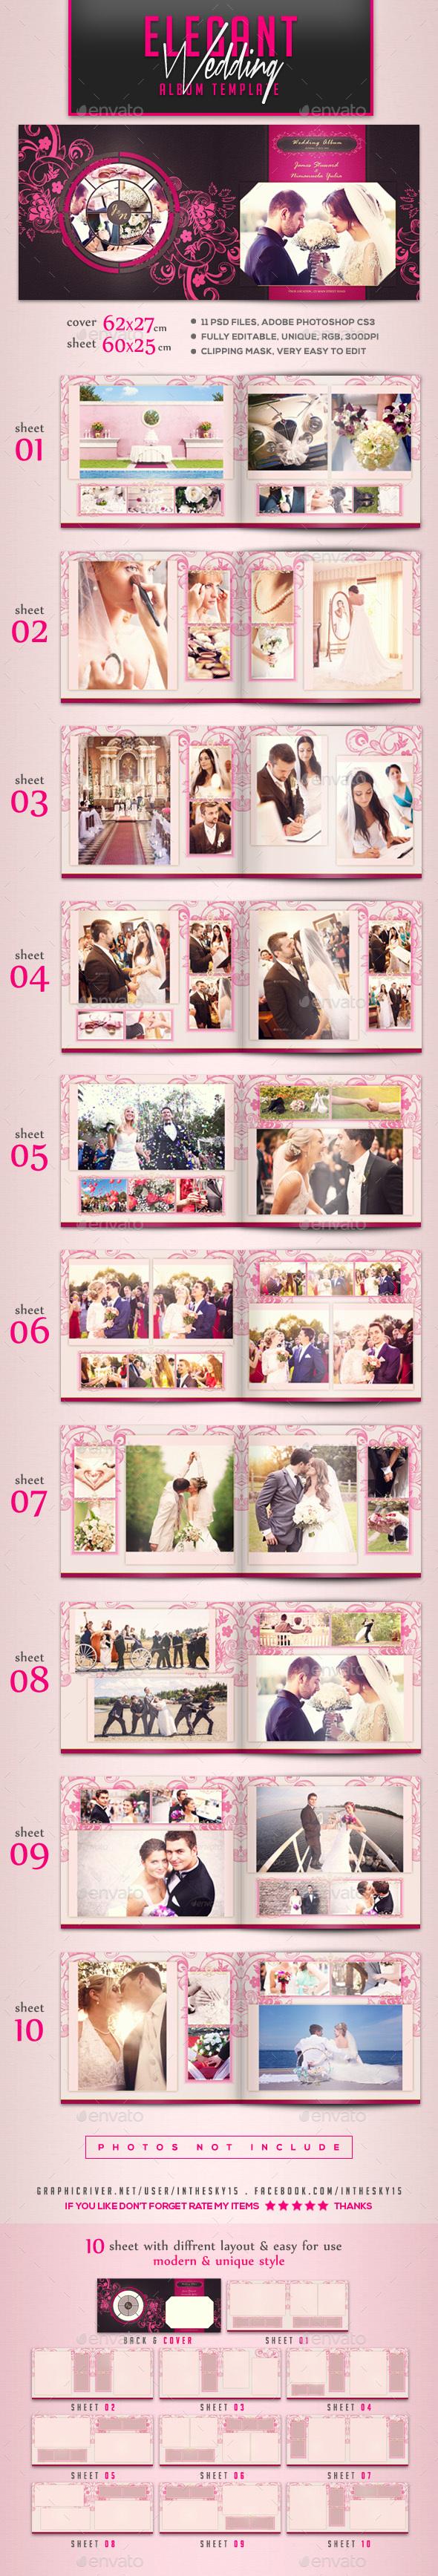 elegant wedding album template by inthesky15 graphicriver